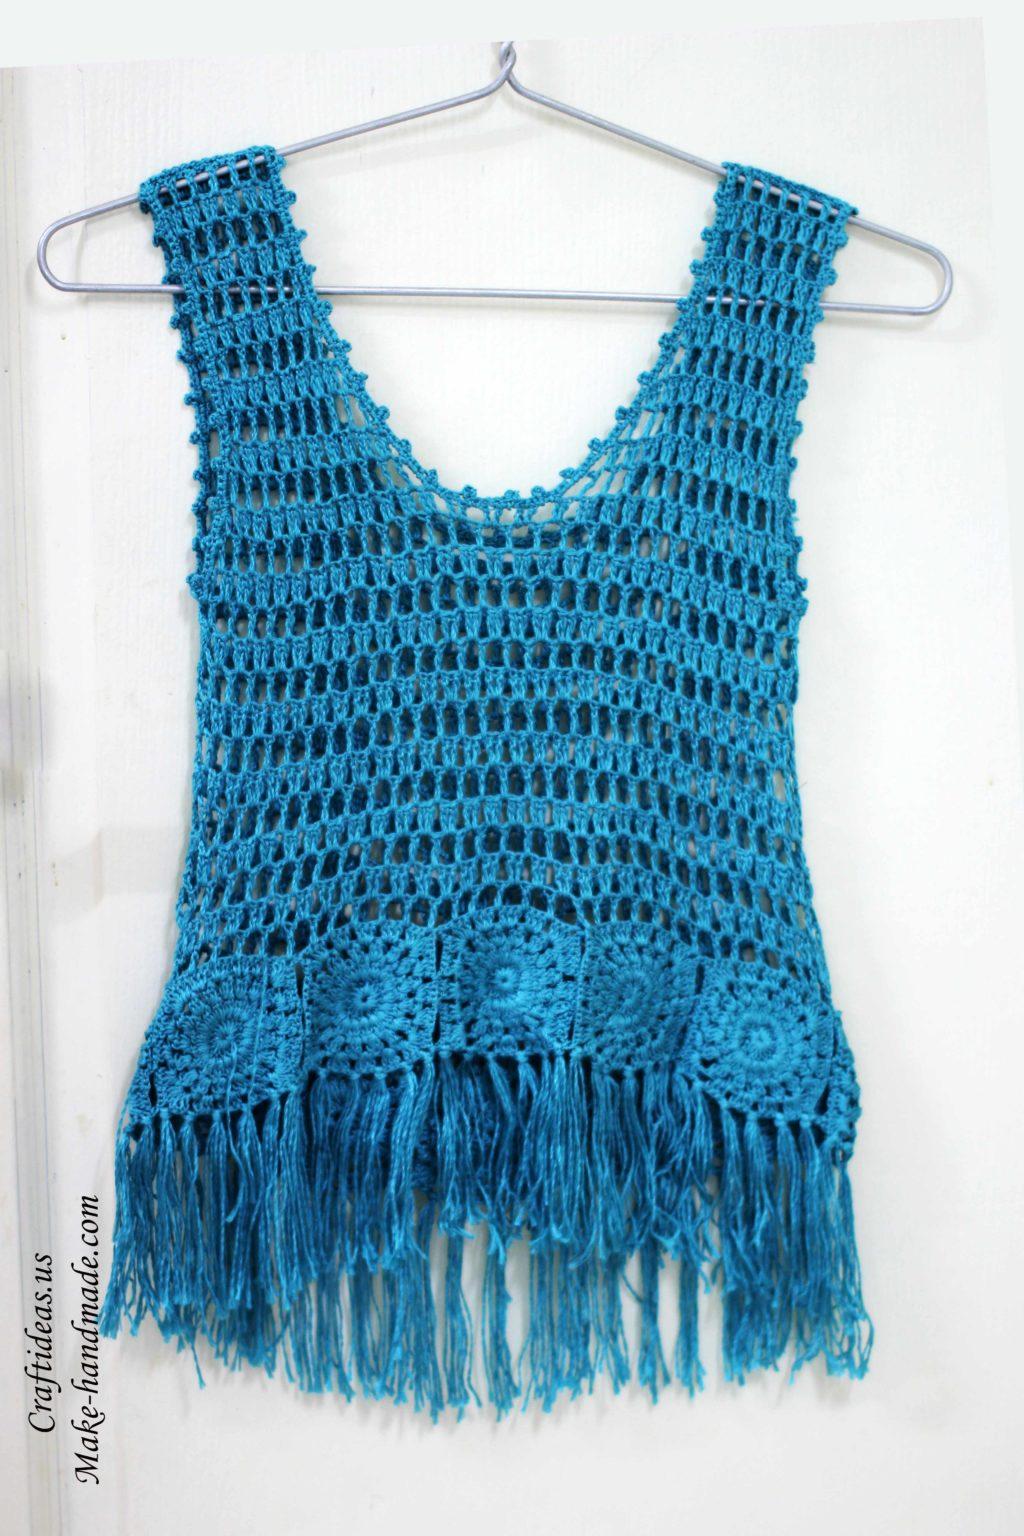 Crochet fashion cute summer top for women craft ideas for Craft ideas for women